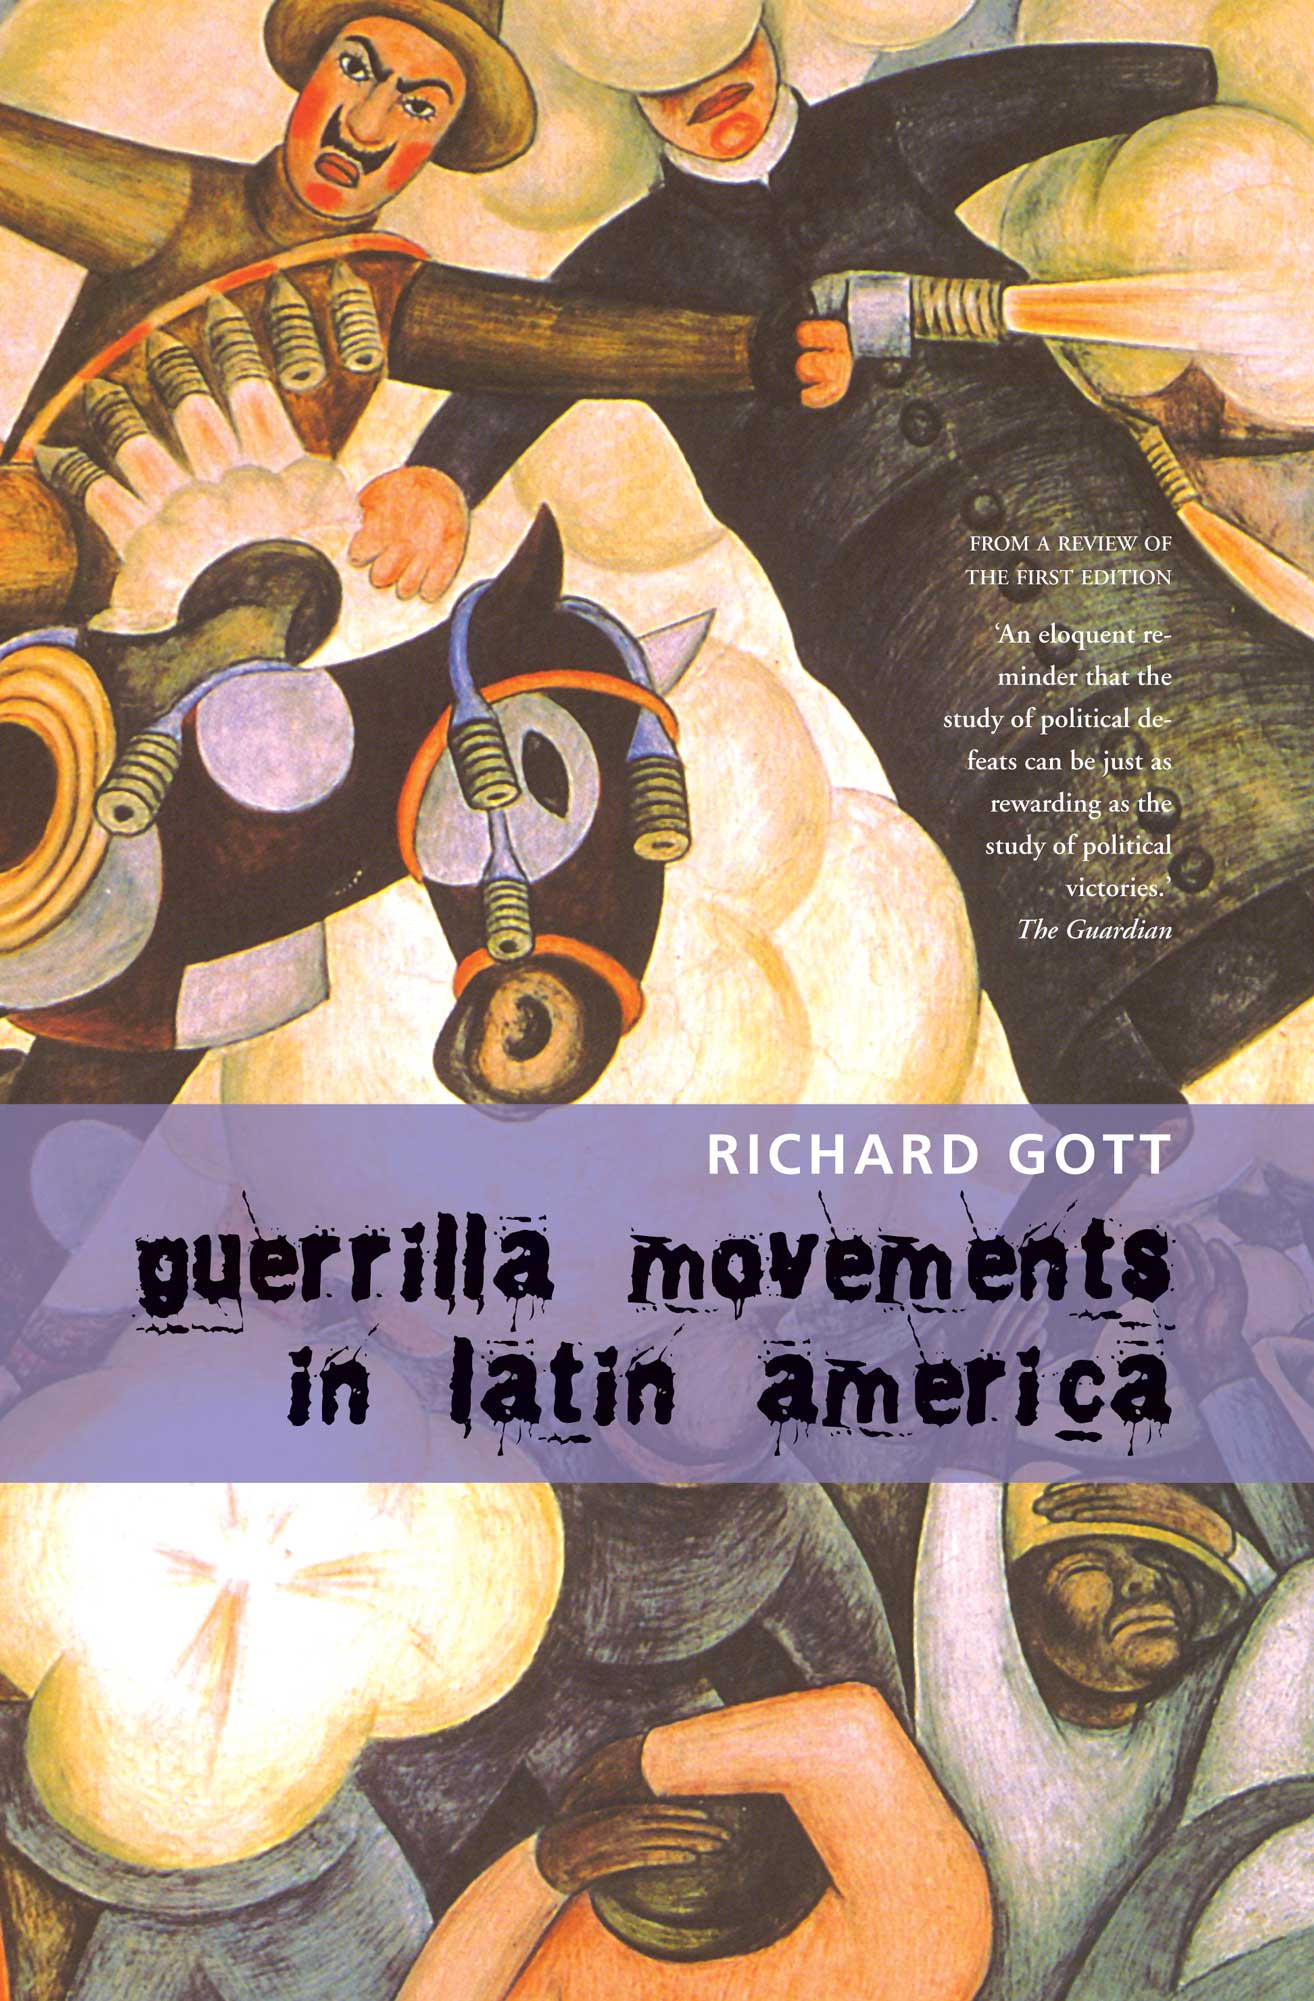 Guerrilla Movements in Latin America by Richard Gott   Seagull Books